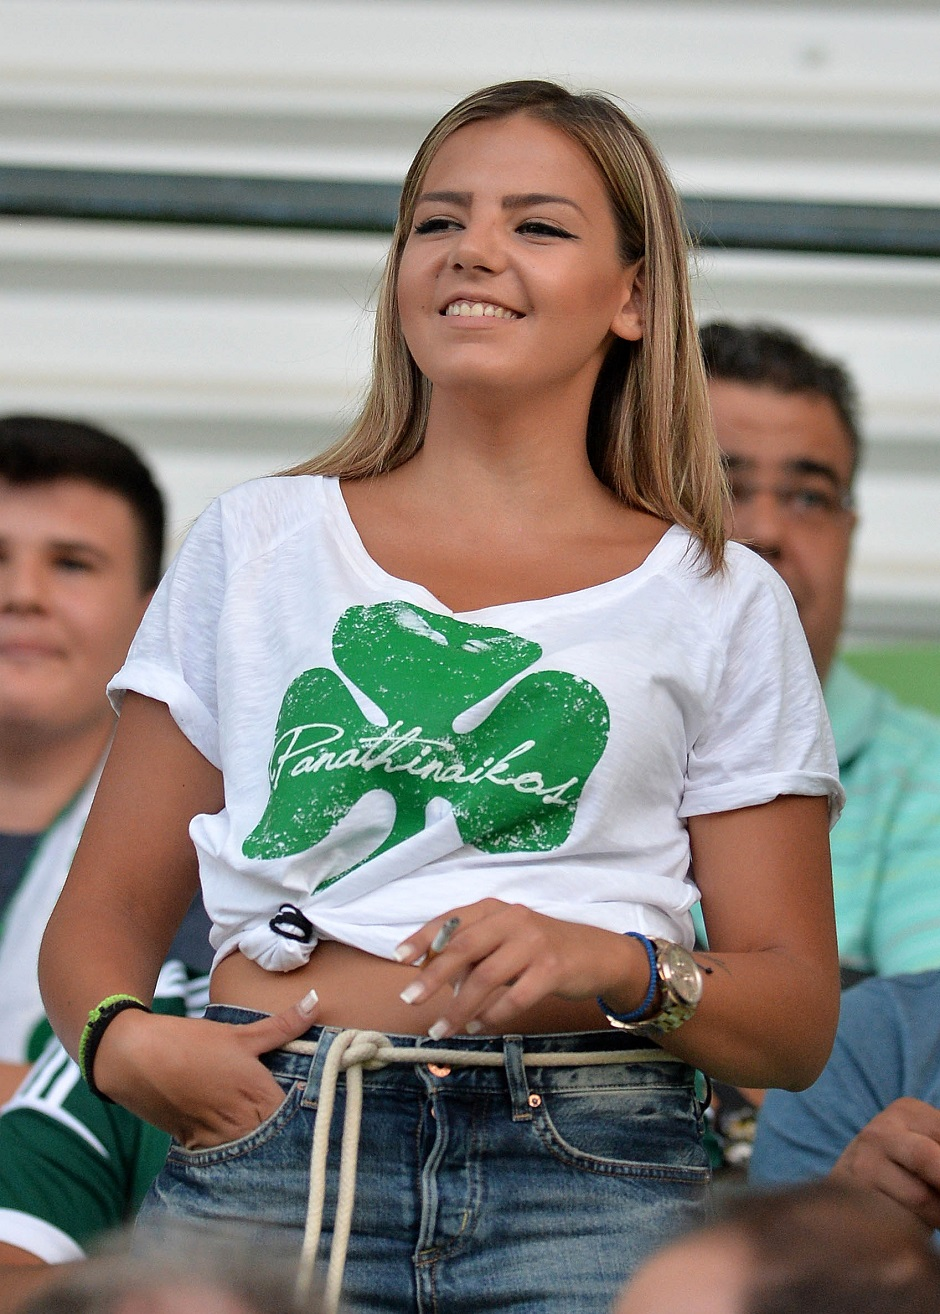 ÐÁÍÁÈÇÍÁÉÊÏÓ - ÁÉÊ (ÃÉÏÕÑÏÐÁ ËÉÃÊ 2016-2017)PANATHINAIKOS - AIK (EUROPA LEAGUE 2016-2017)